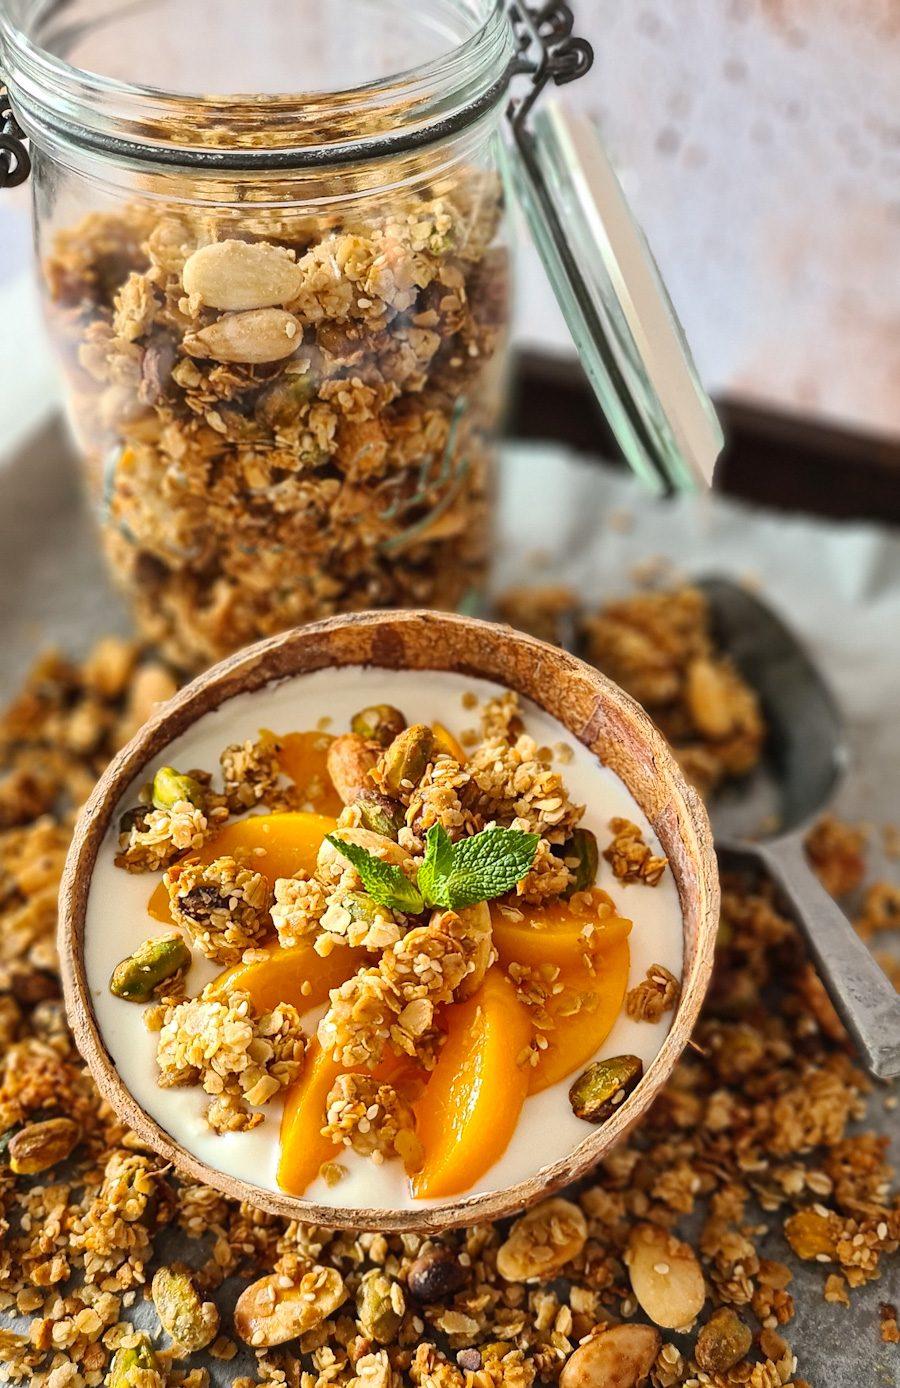 Sesame, Almond, Pistachio & Orange blossom Granola